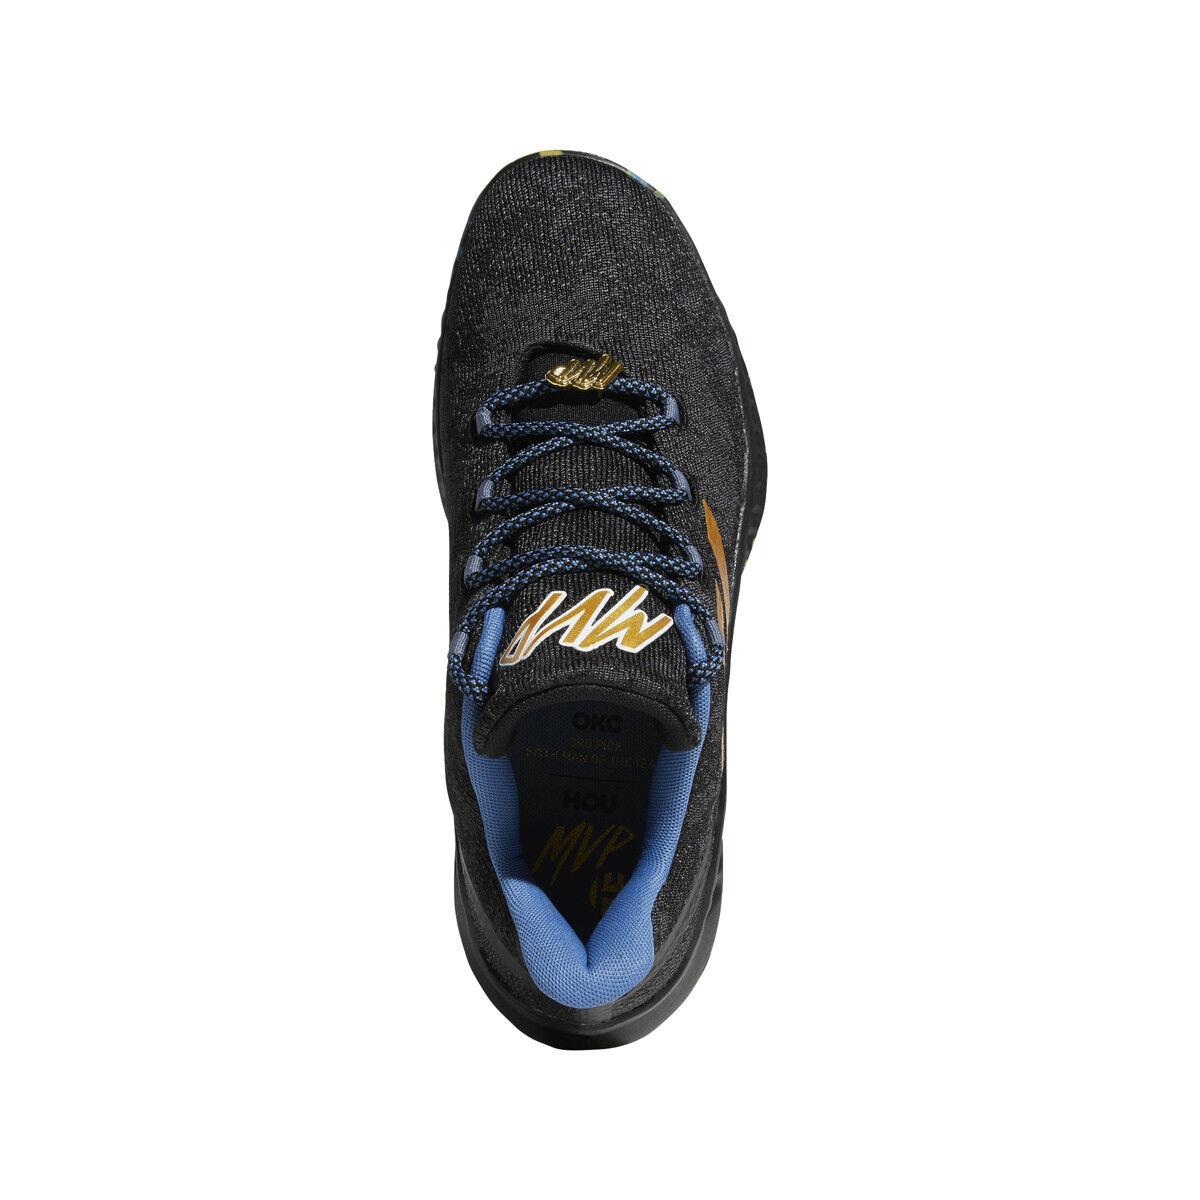 Adidas Men's James Harden Volume Volume Harden Vol. 2 B/E X MVP Basketball Shoes - F36813 b4e249